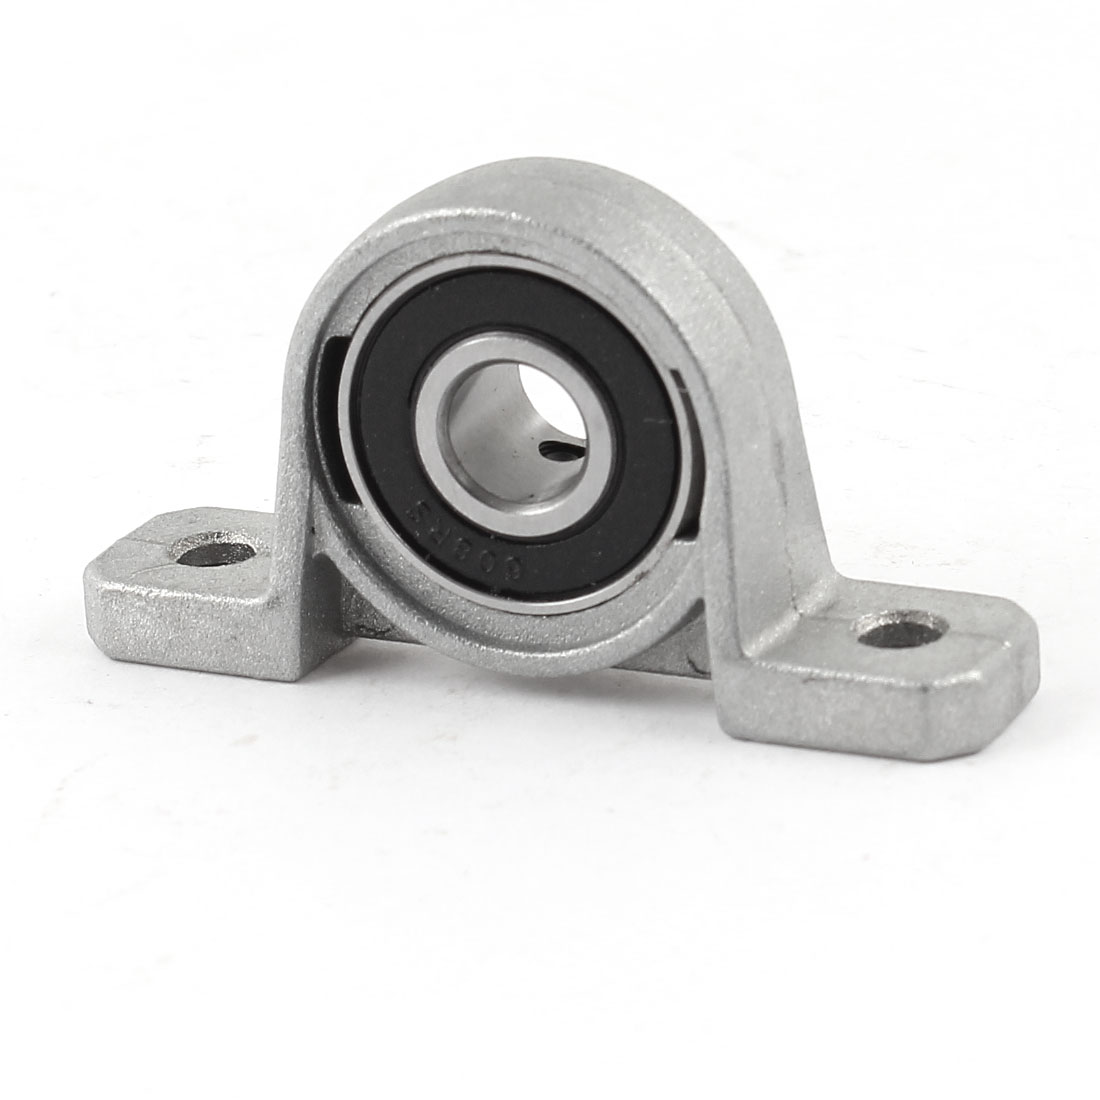 KP08 Pillow Block 8mm Bore Diameter Ball Bearing Stainless Steel